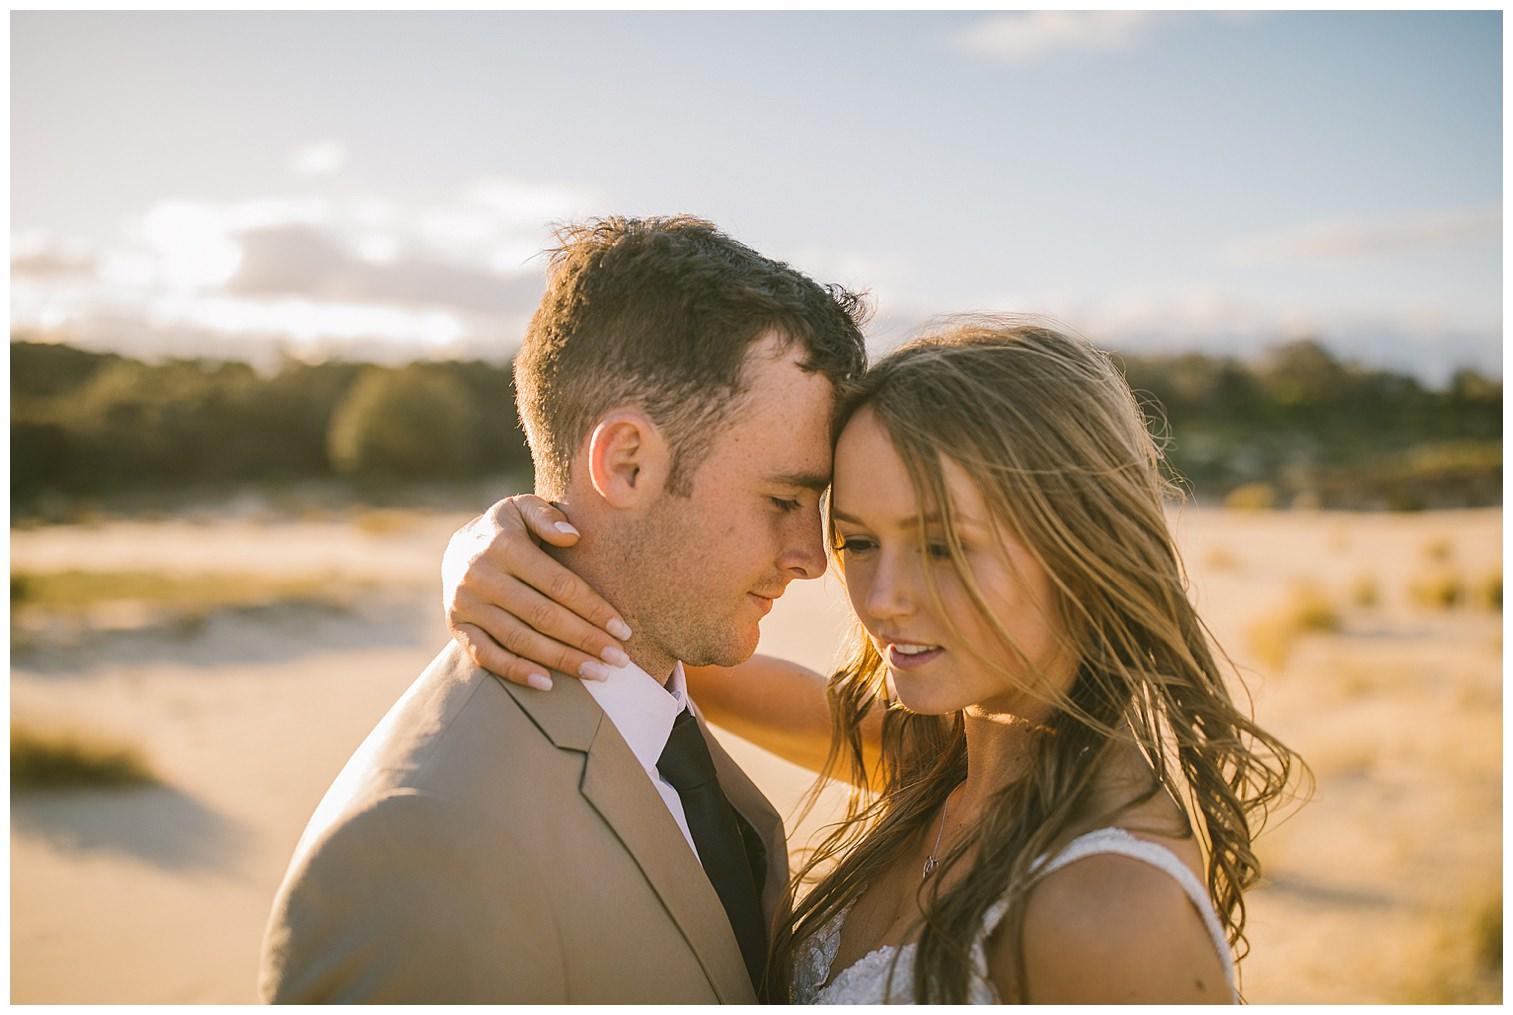 bodalla farm south coast wedding, tuross wedding photographer, southern highlands wedding photographer, beach wedding photographer